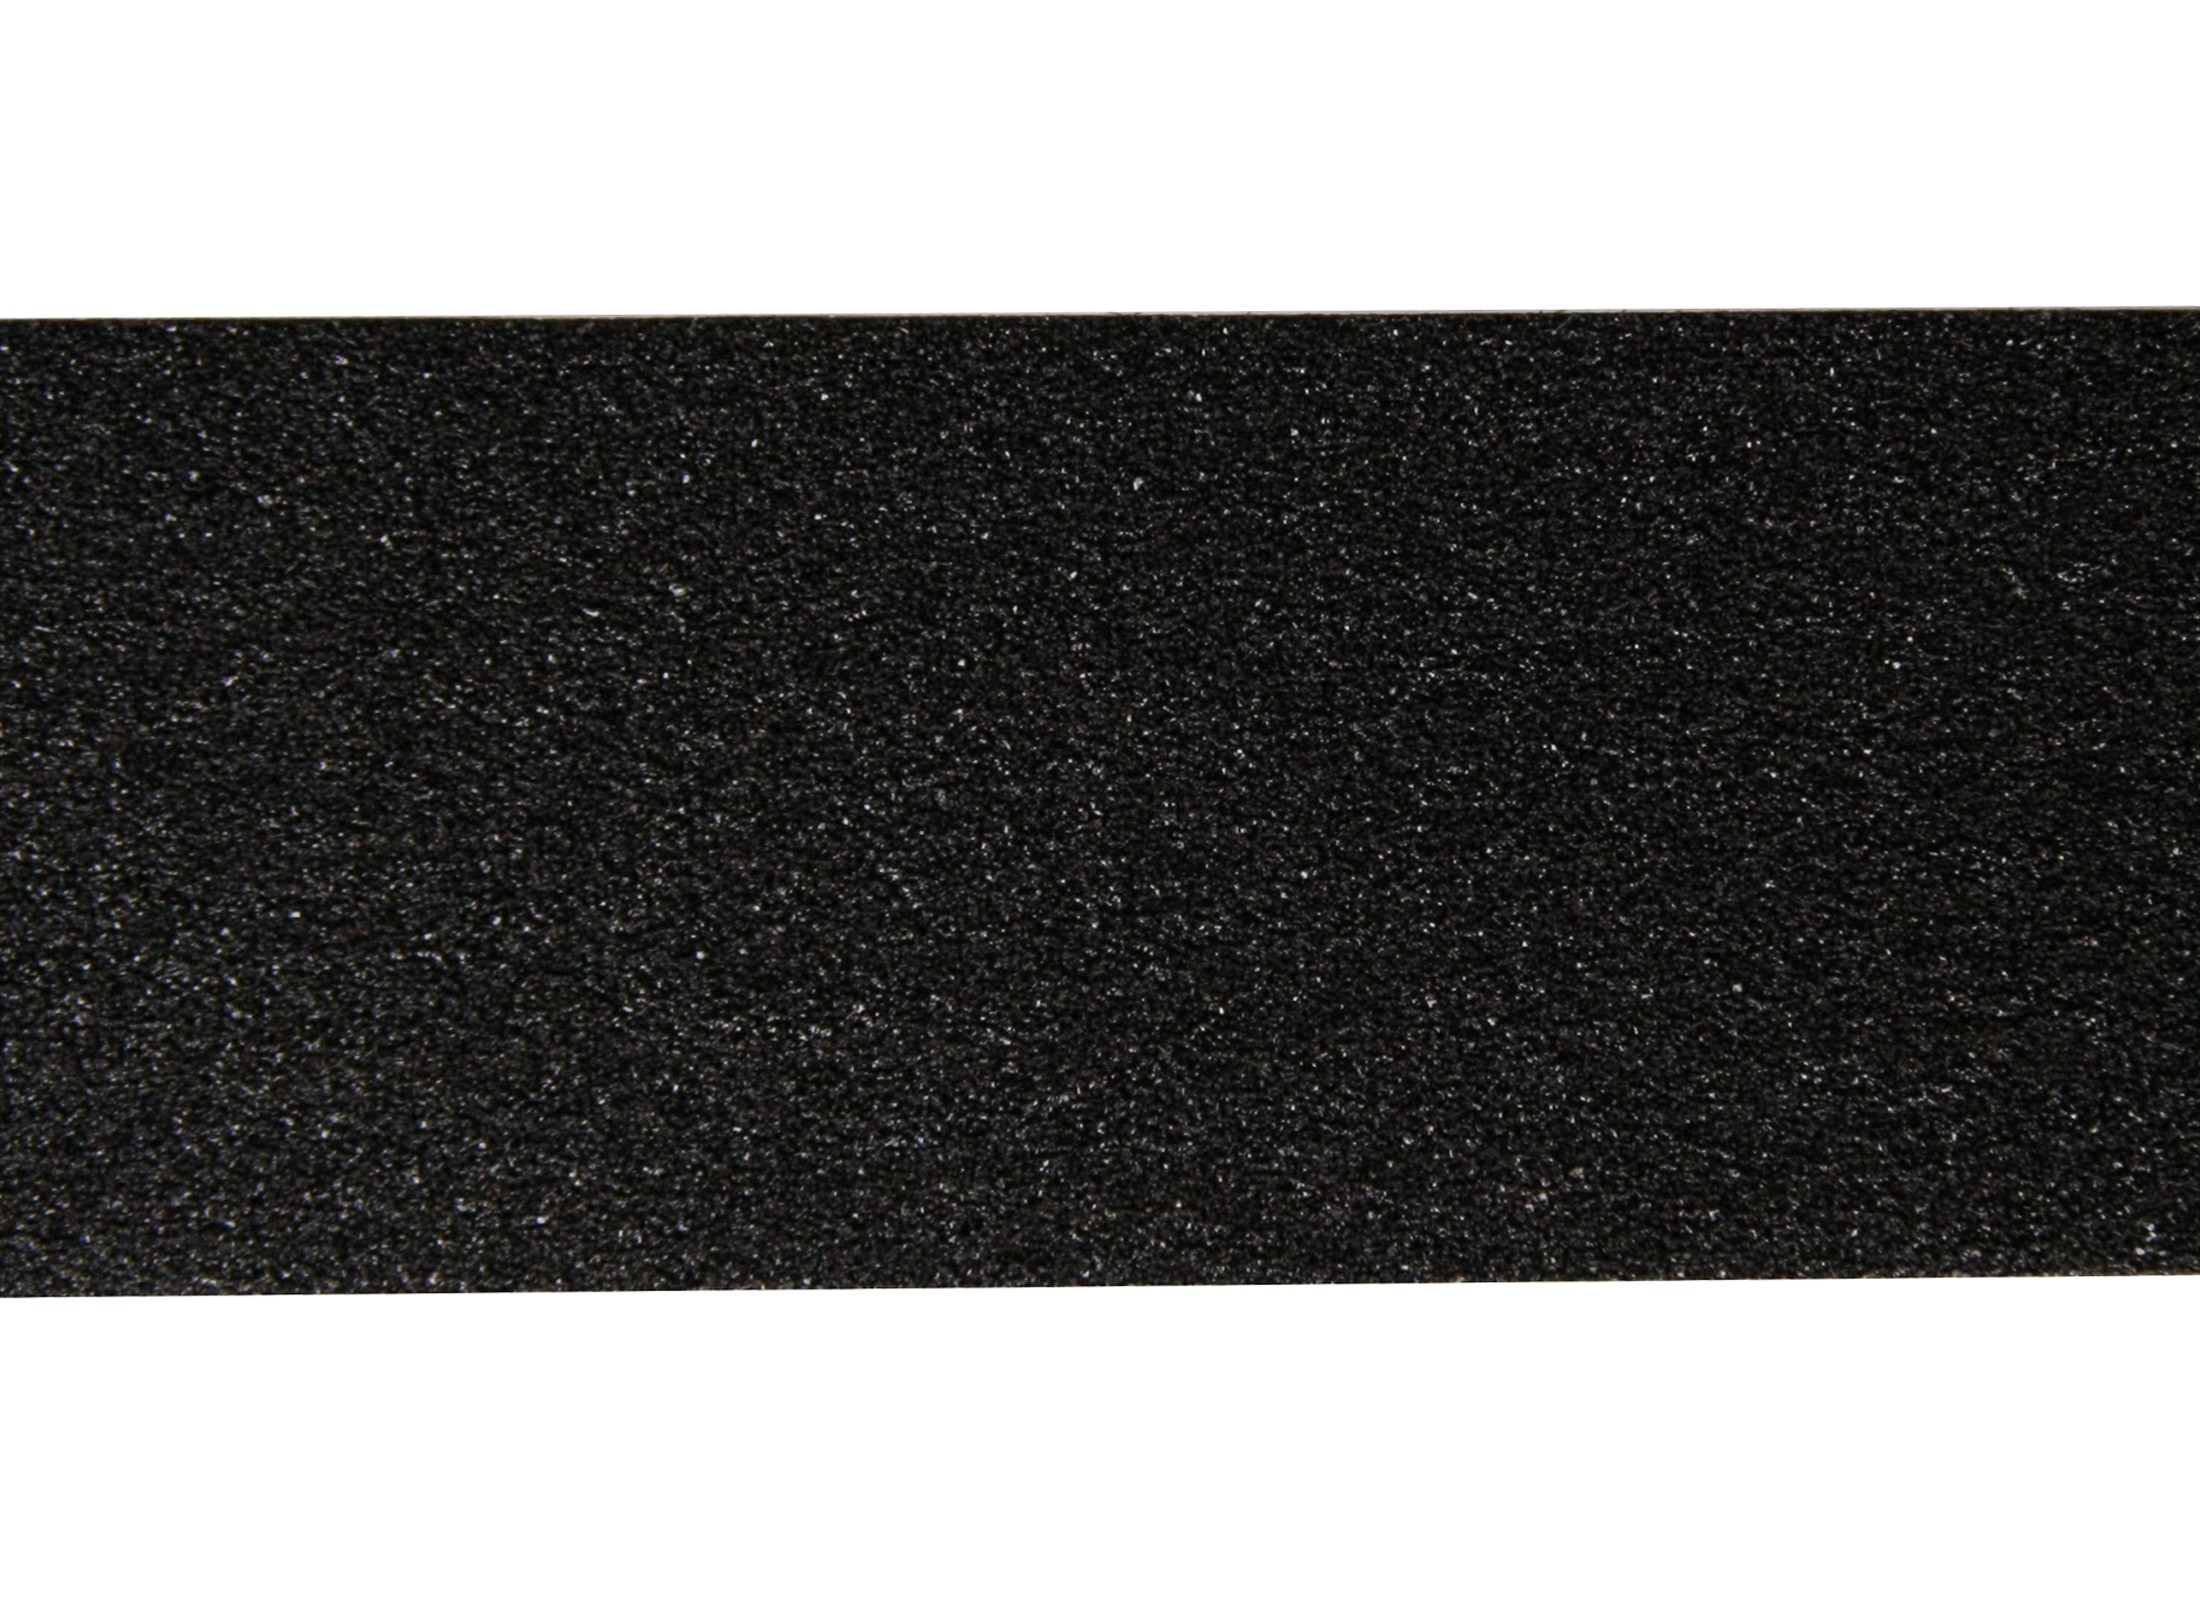 sweetpro ta stb 018 50 anti rutsch klebeband schwarz. Black Bedroom Furniture Sets. Home Design Ideas